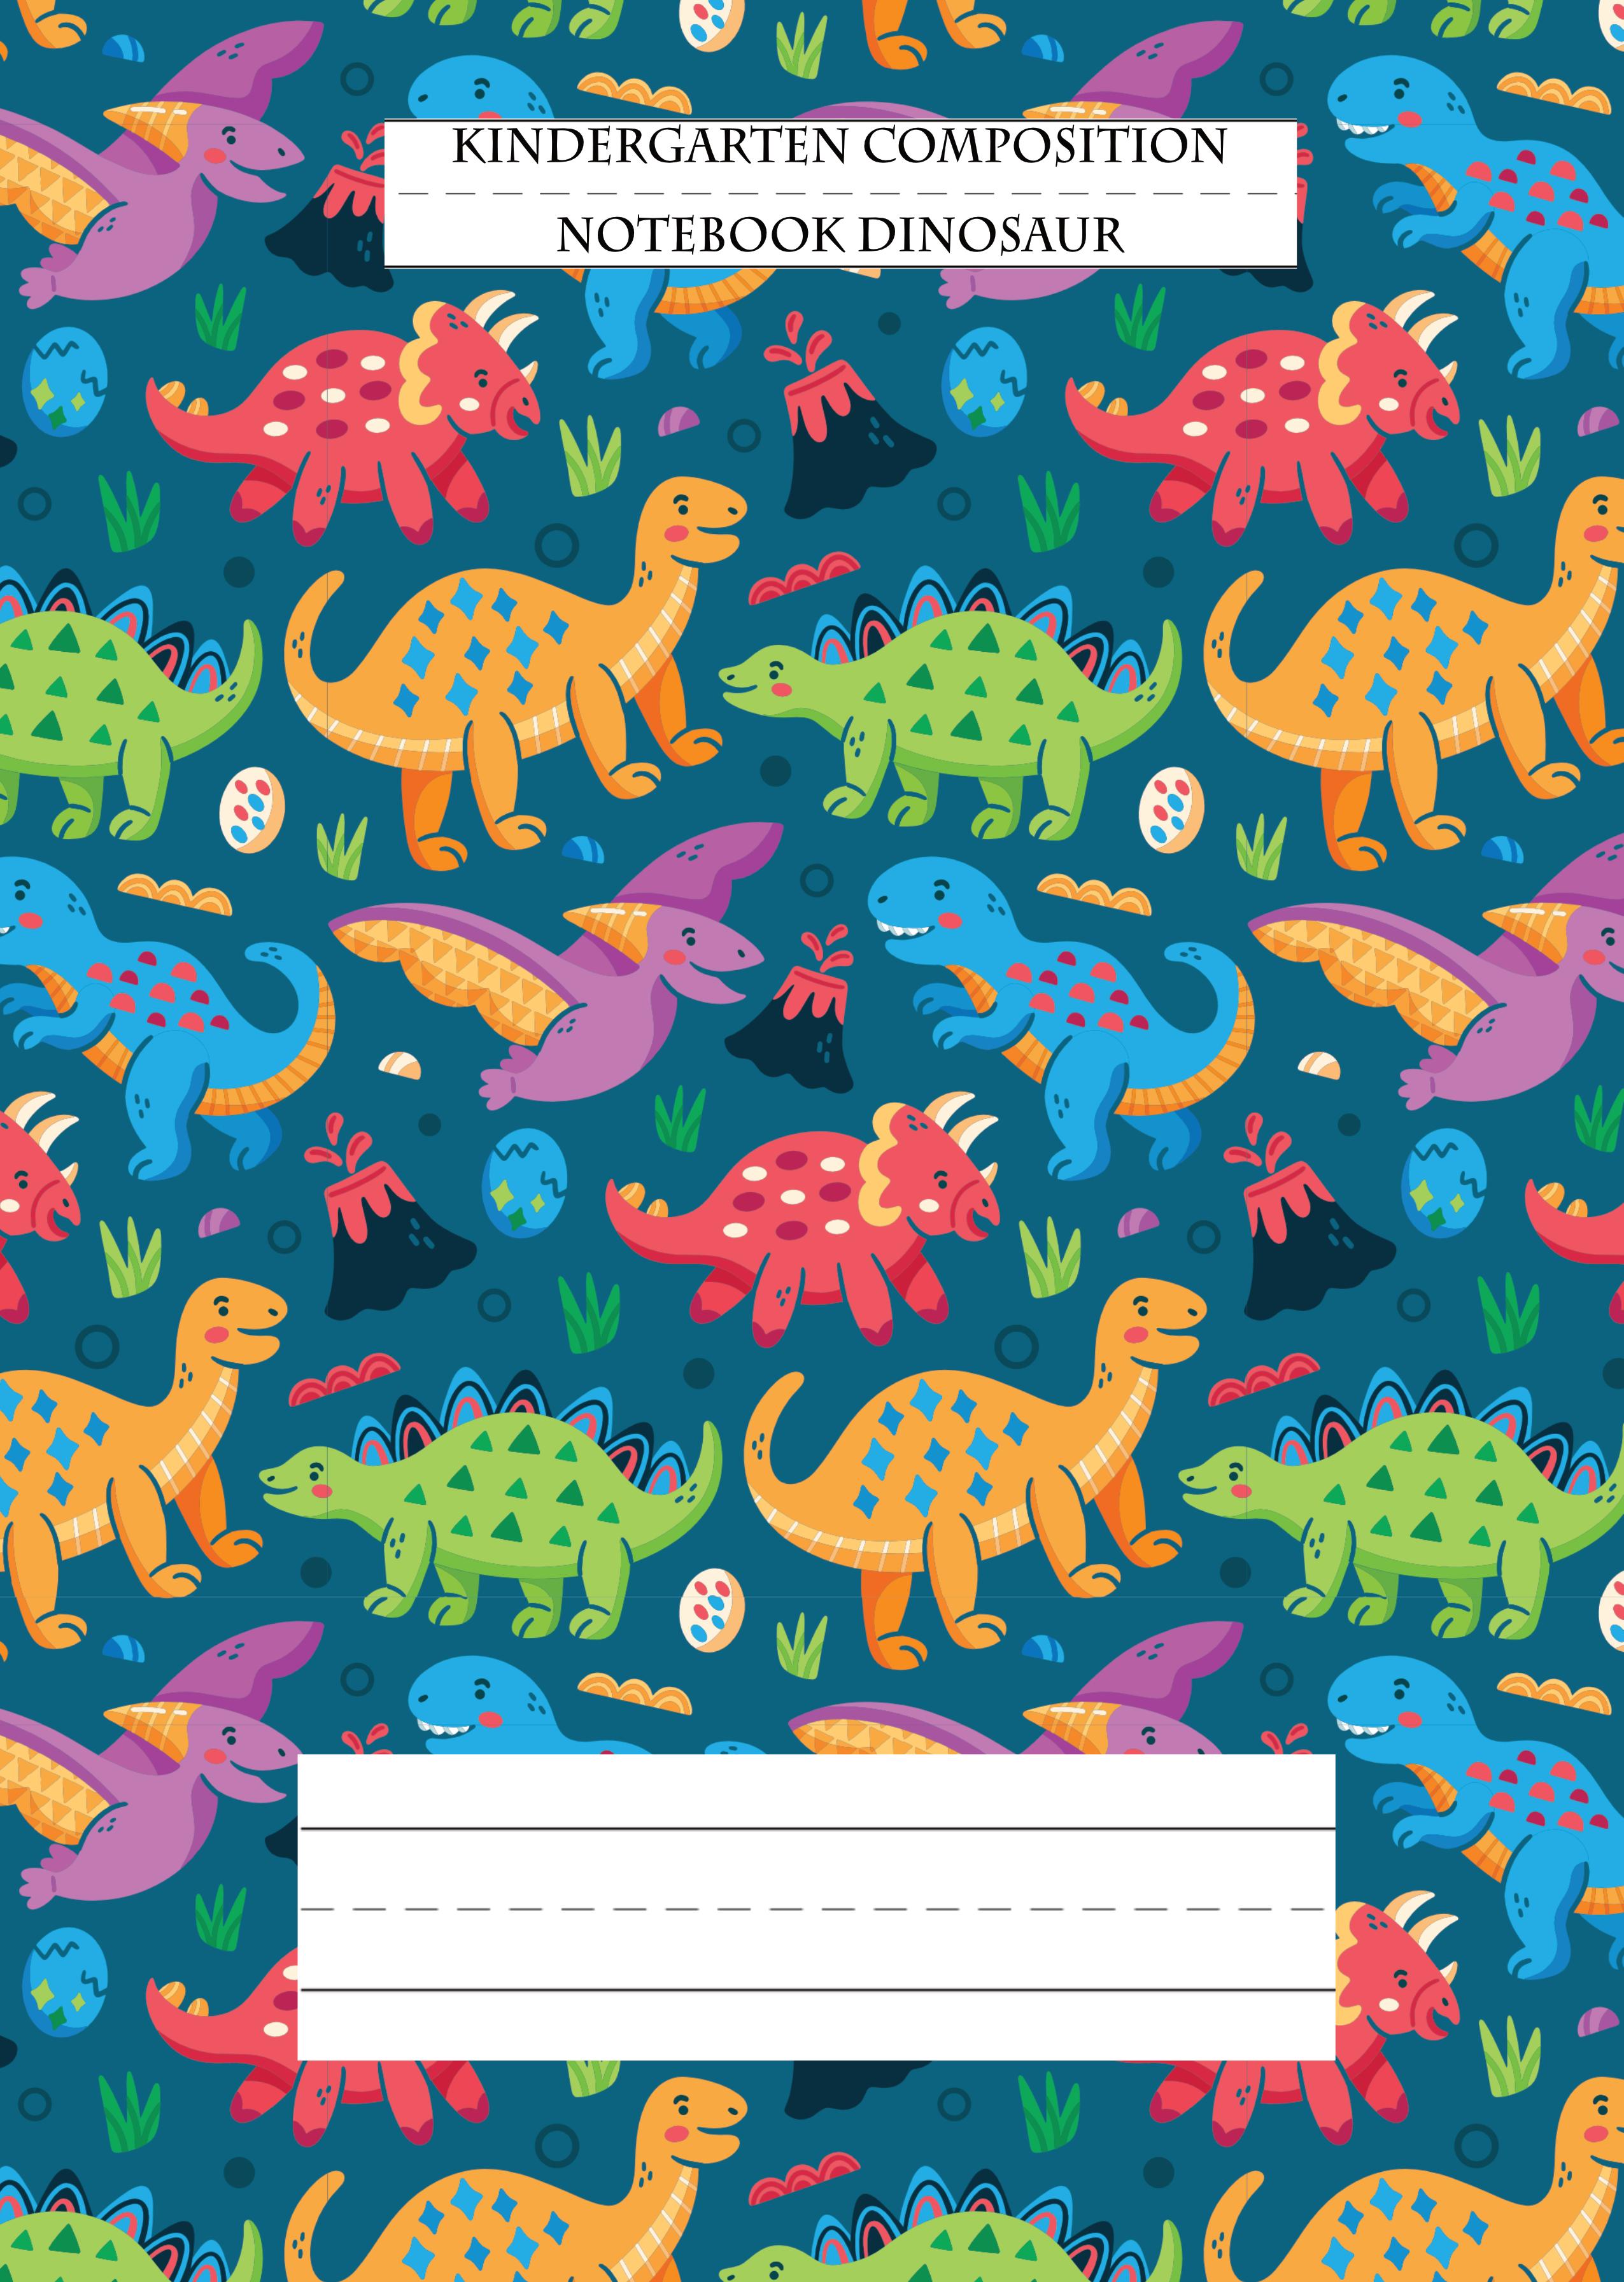 Kindergarten Composition Notebook Dinosaur